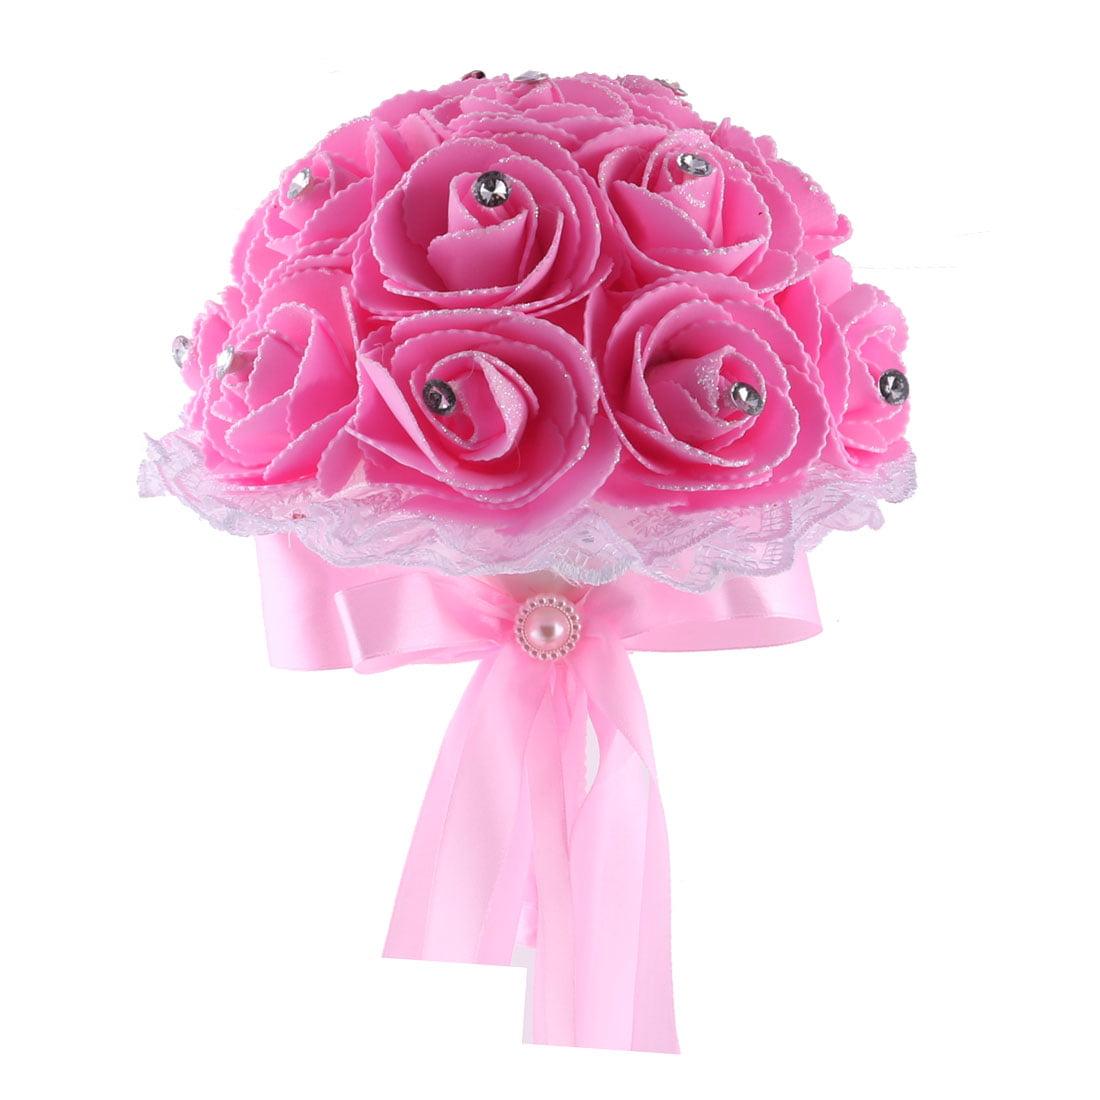 Wedding Banquet Foam Rose Buds Handhold Artificial Bouquet Craft Ornament Pink